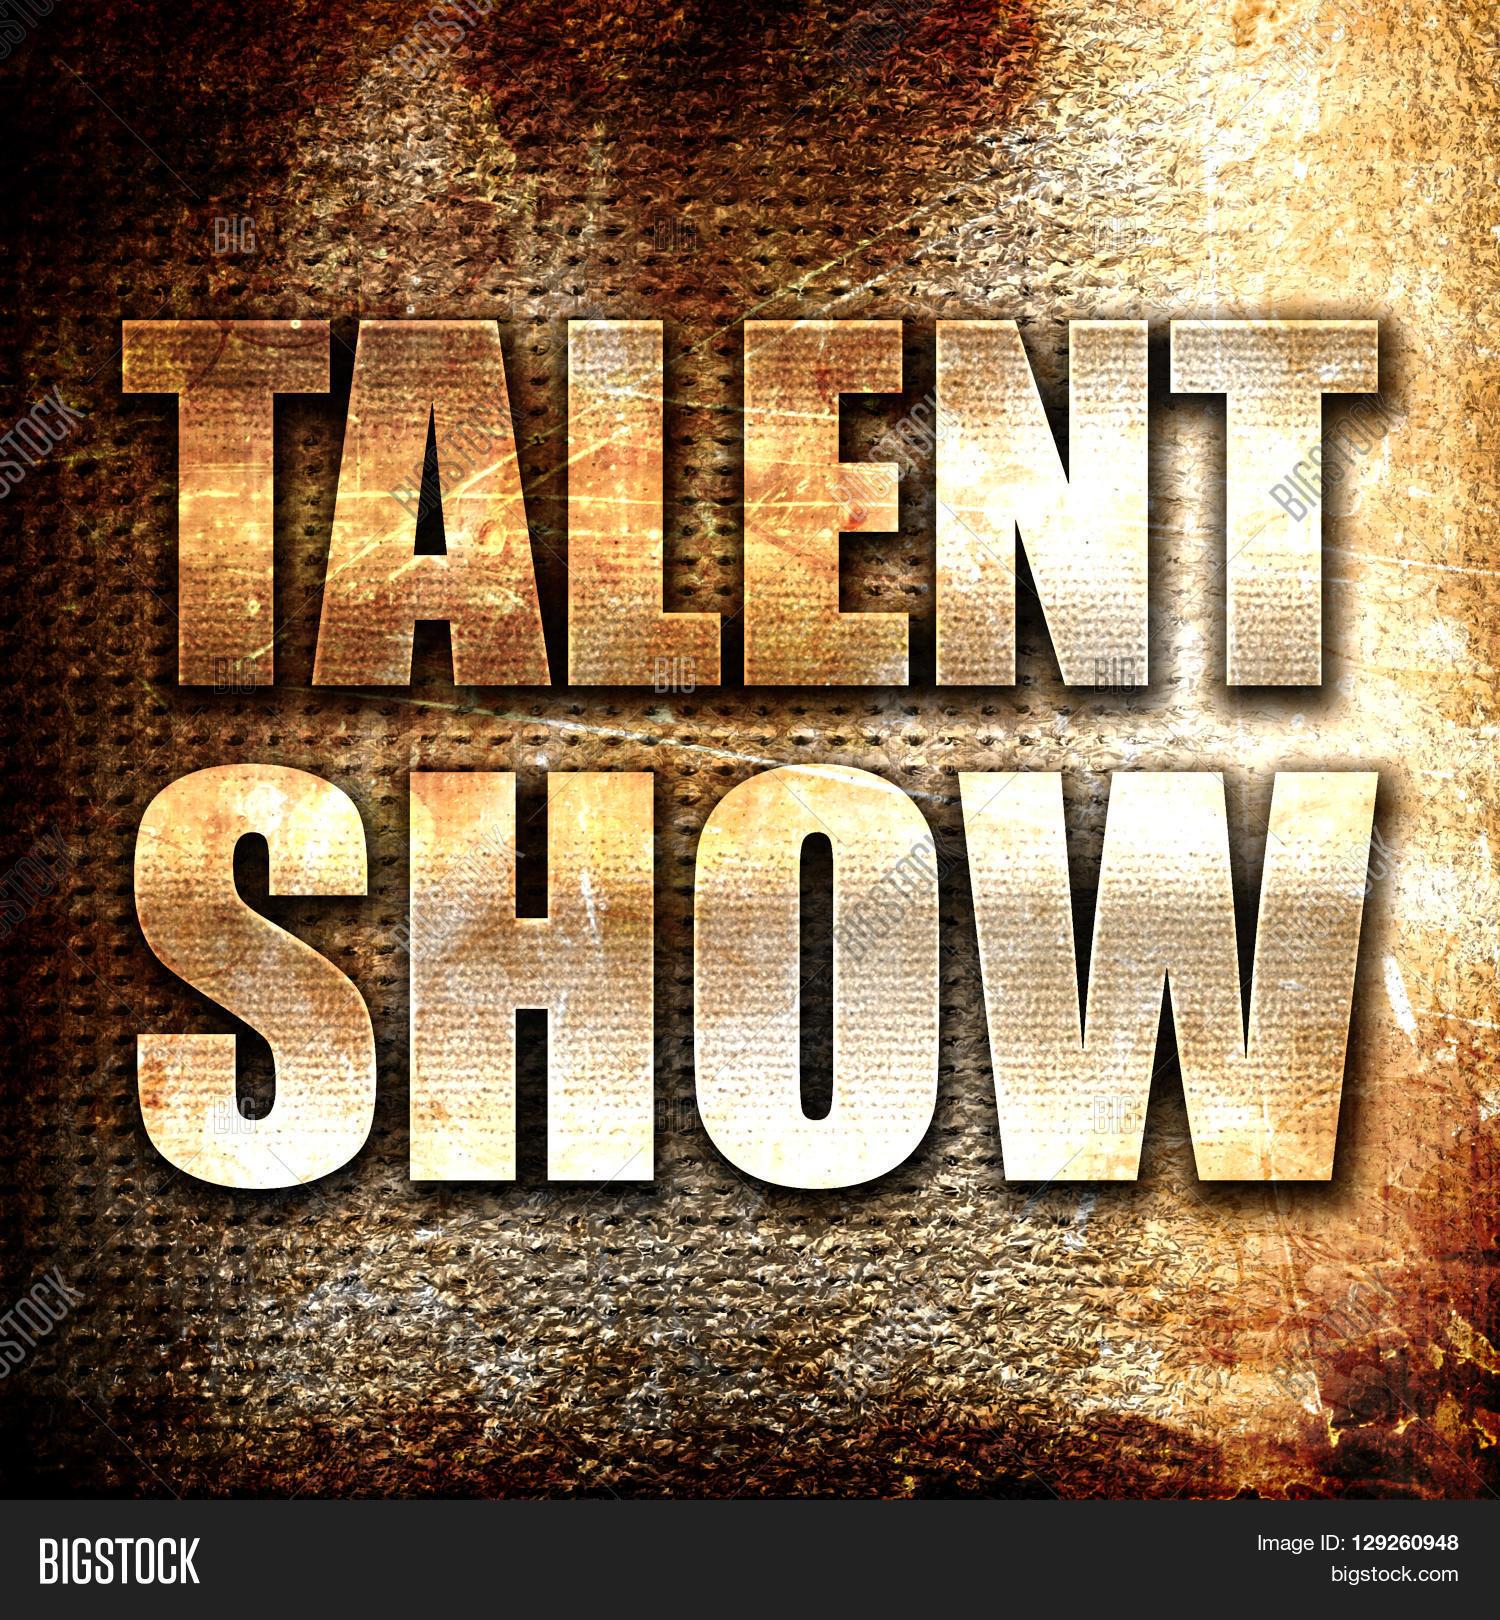 20 Unique and Funny Talent Show Ideas